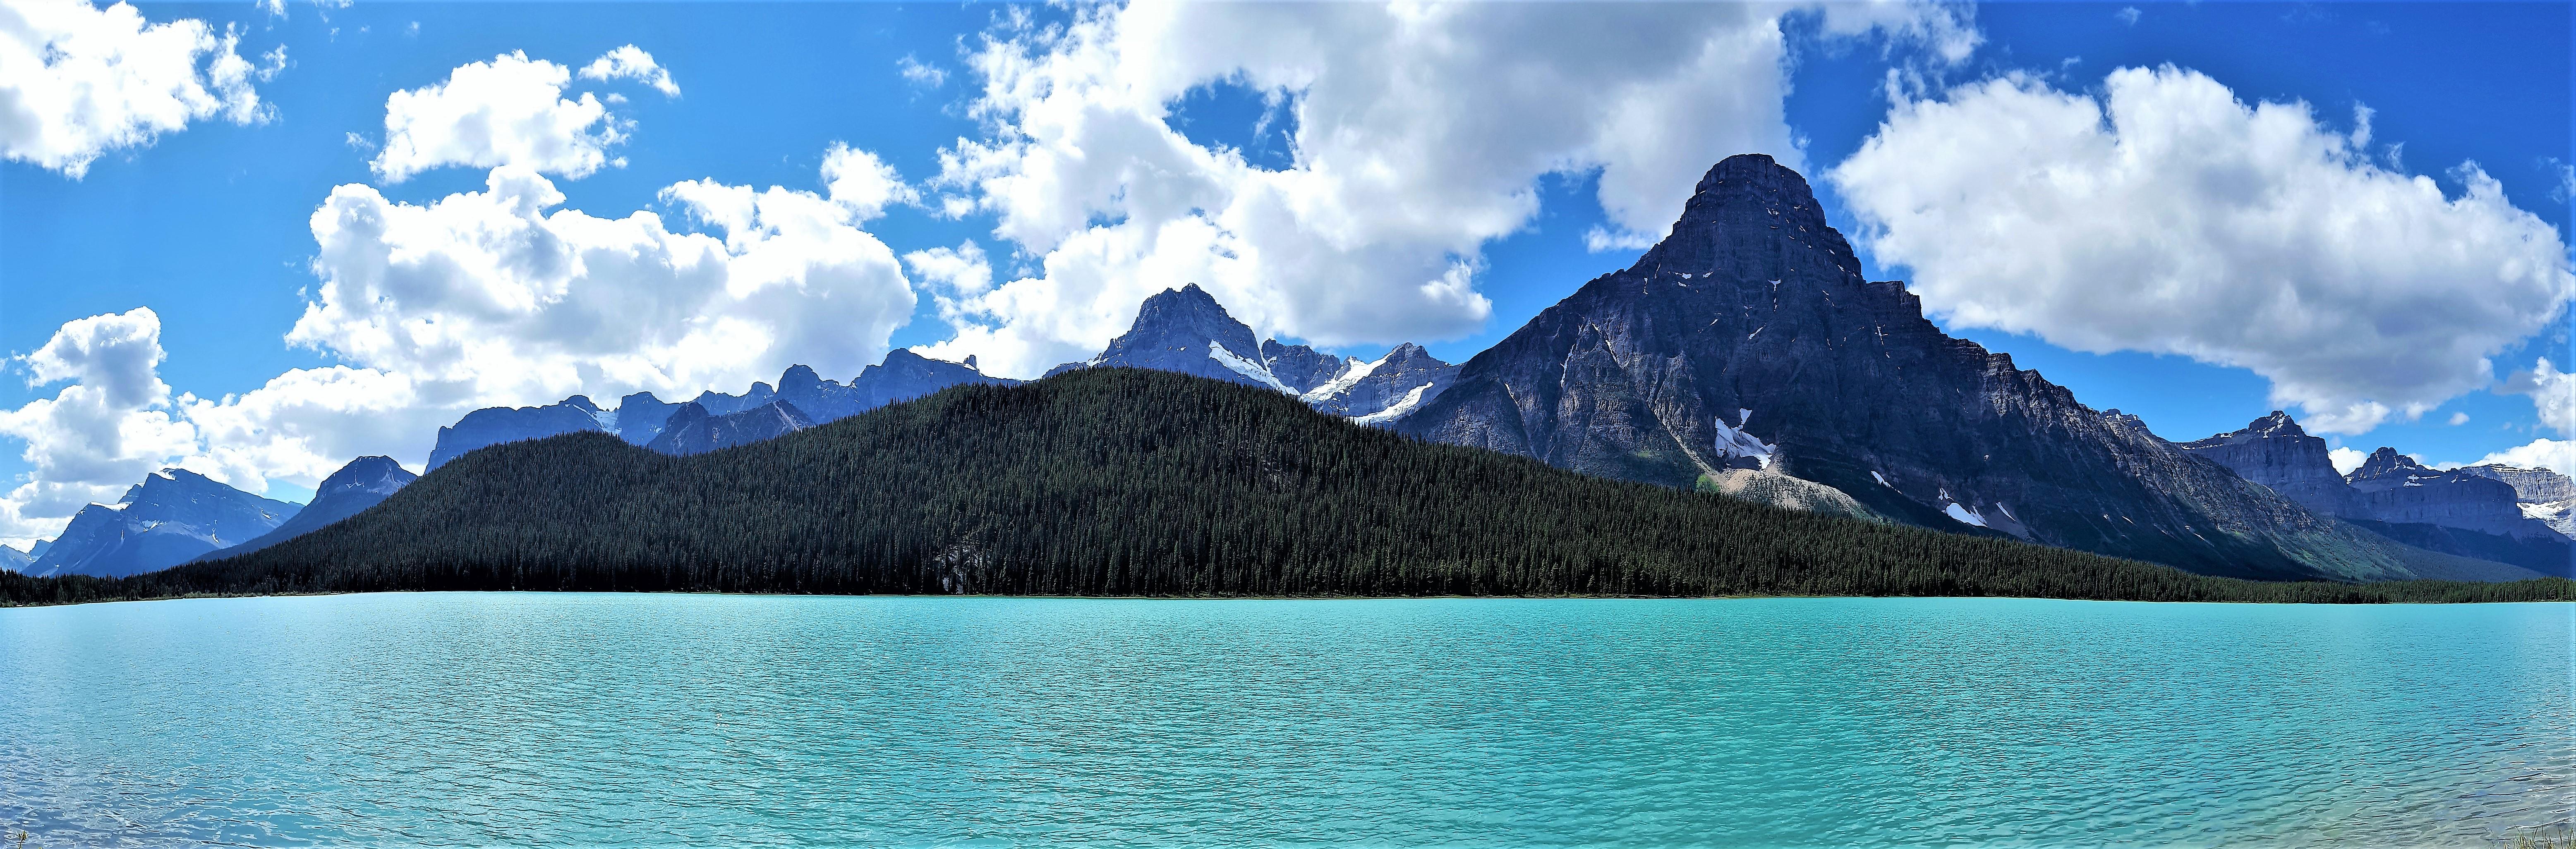 Waterfowl Lake, Jasper NP